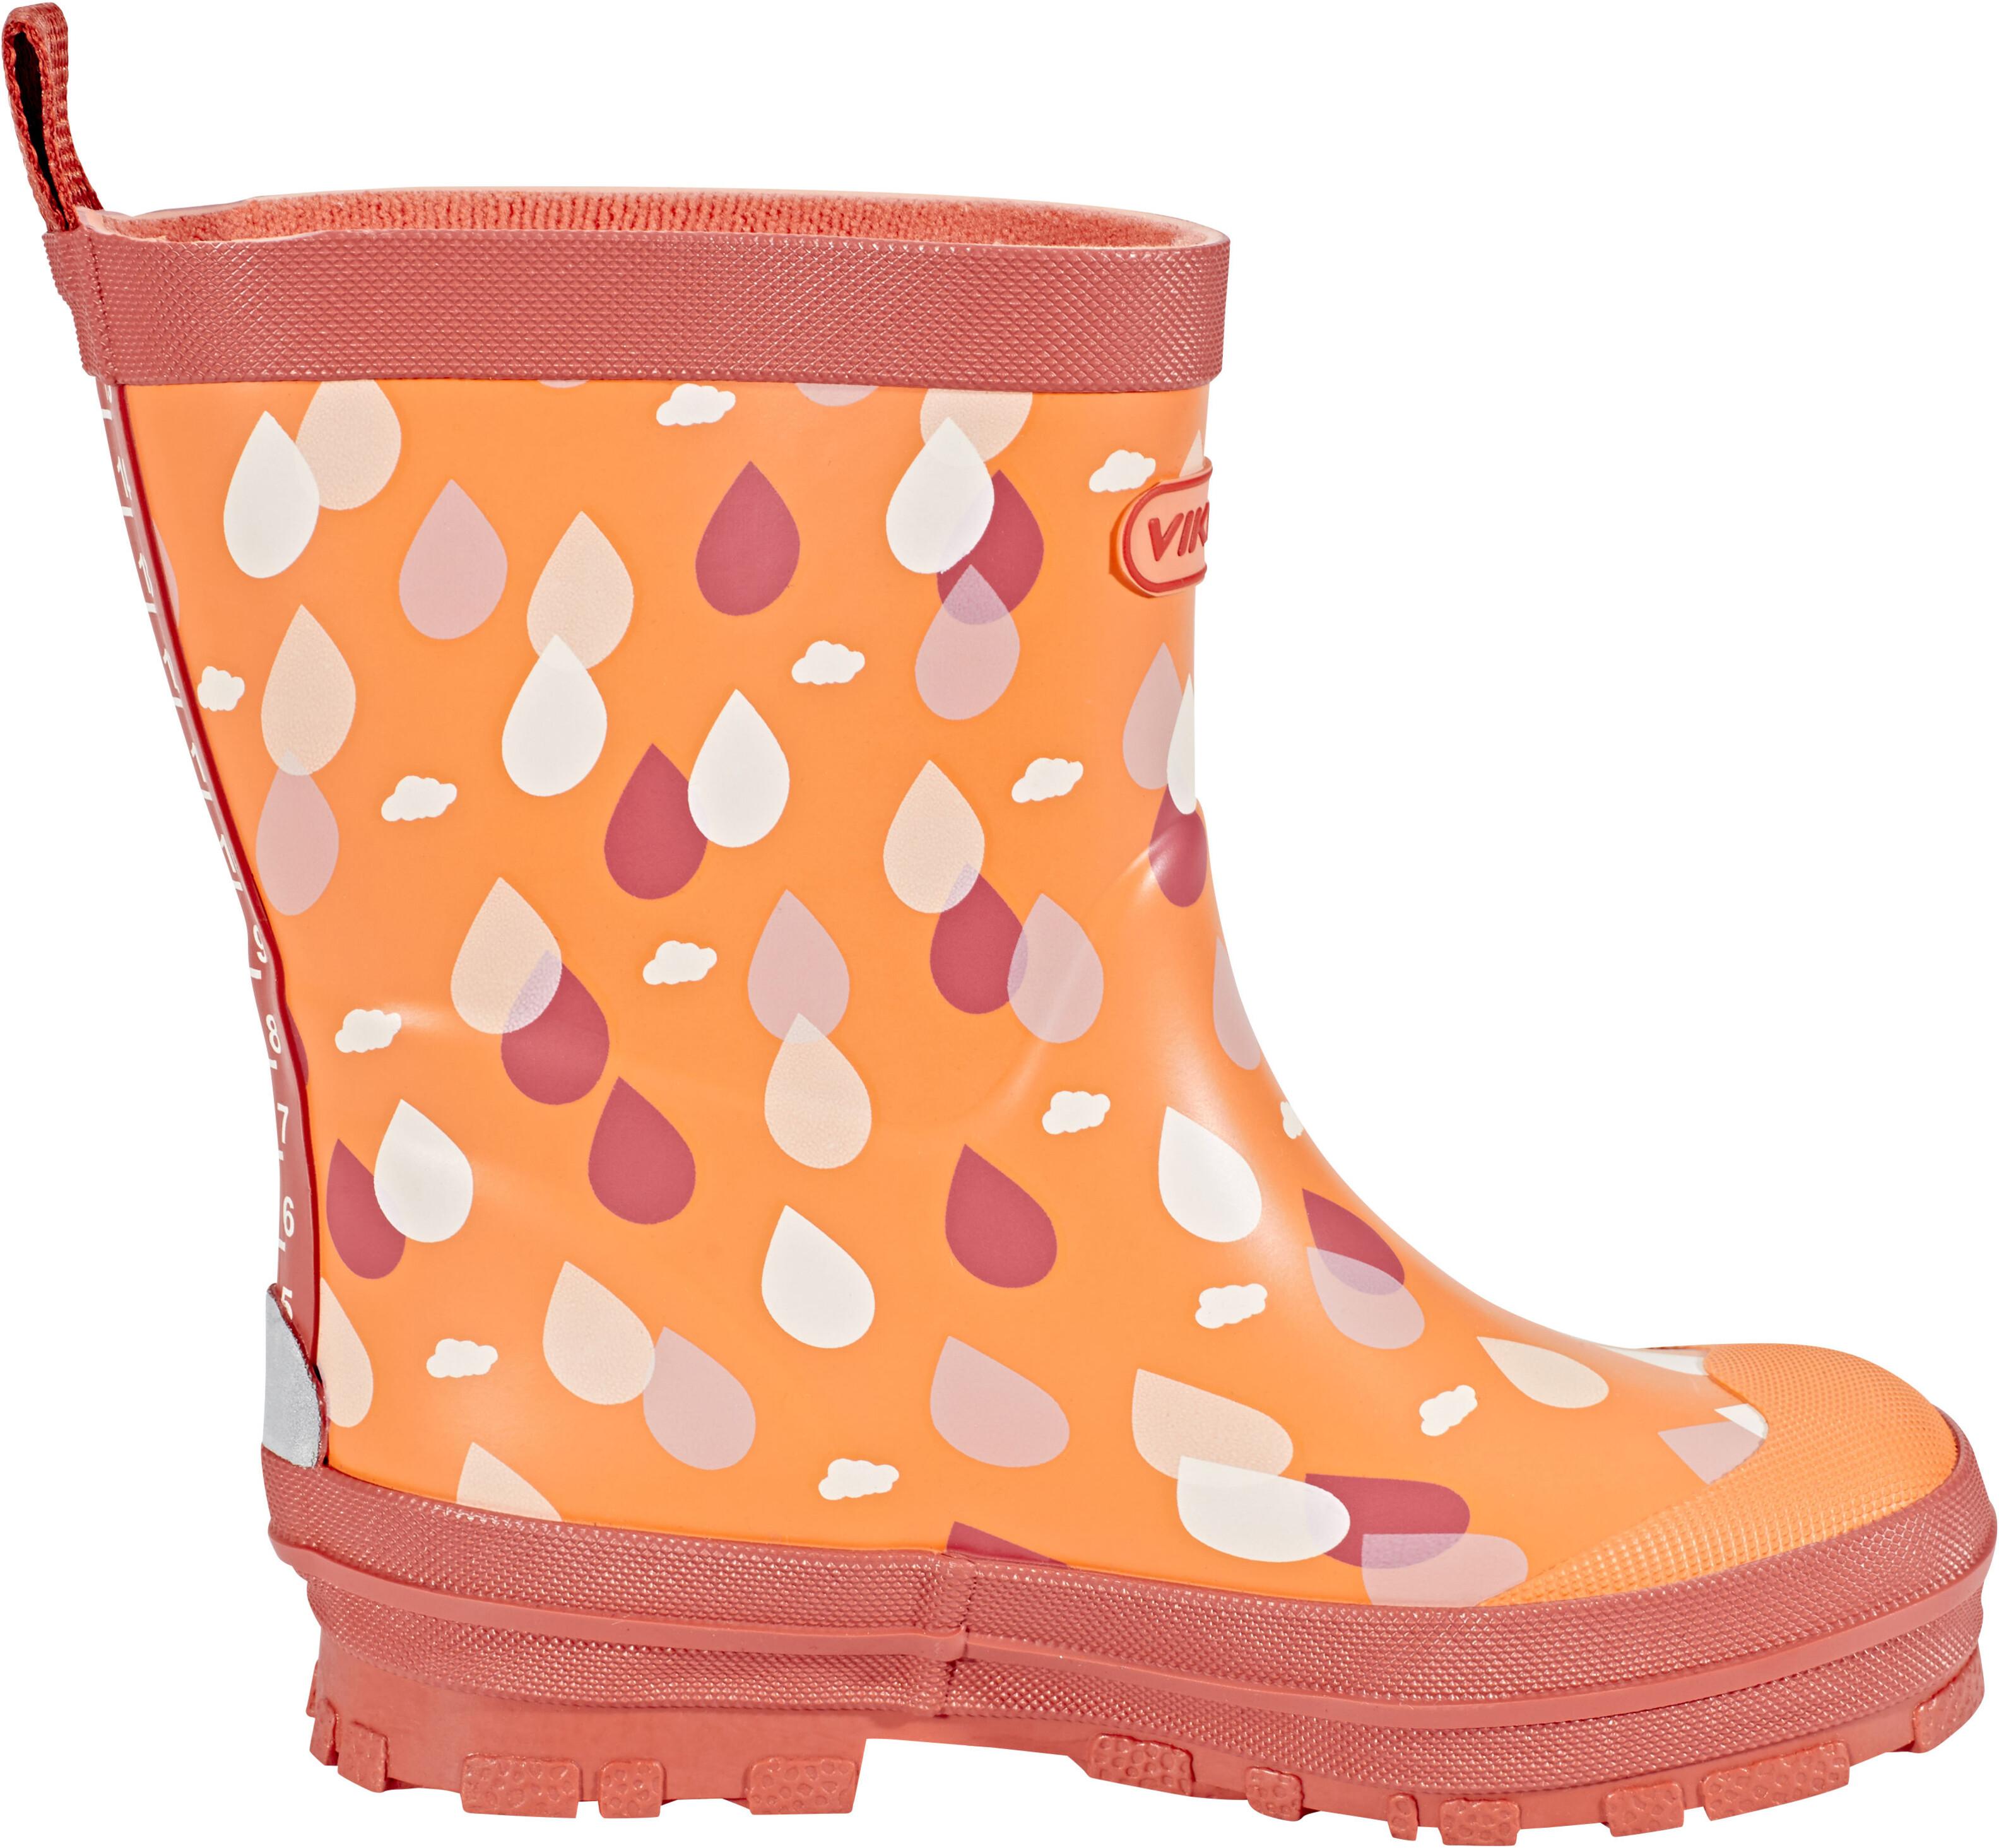 viking footwear dr pe bottes en caoutchouc enfant orange sur campz. Black Bedroom Furniture Sets. Home Design Ideas